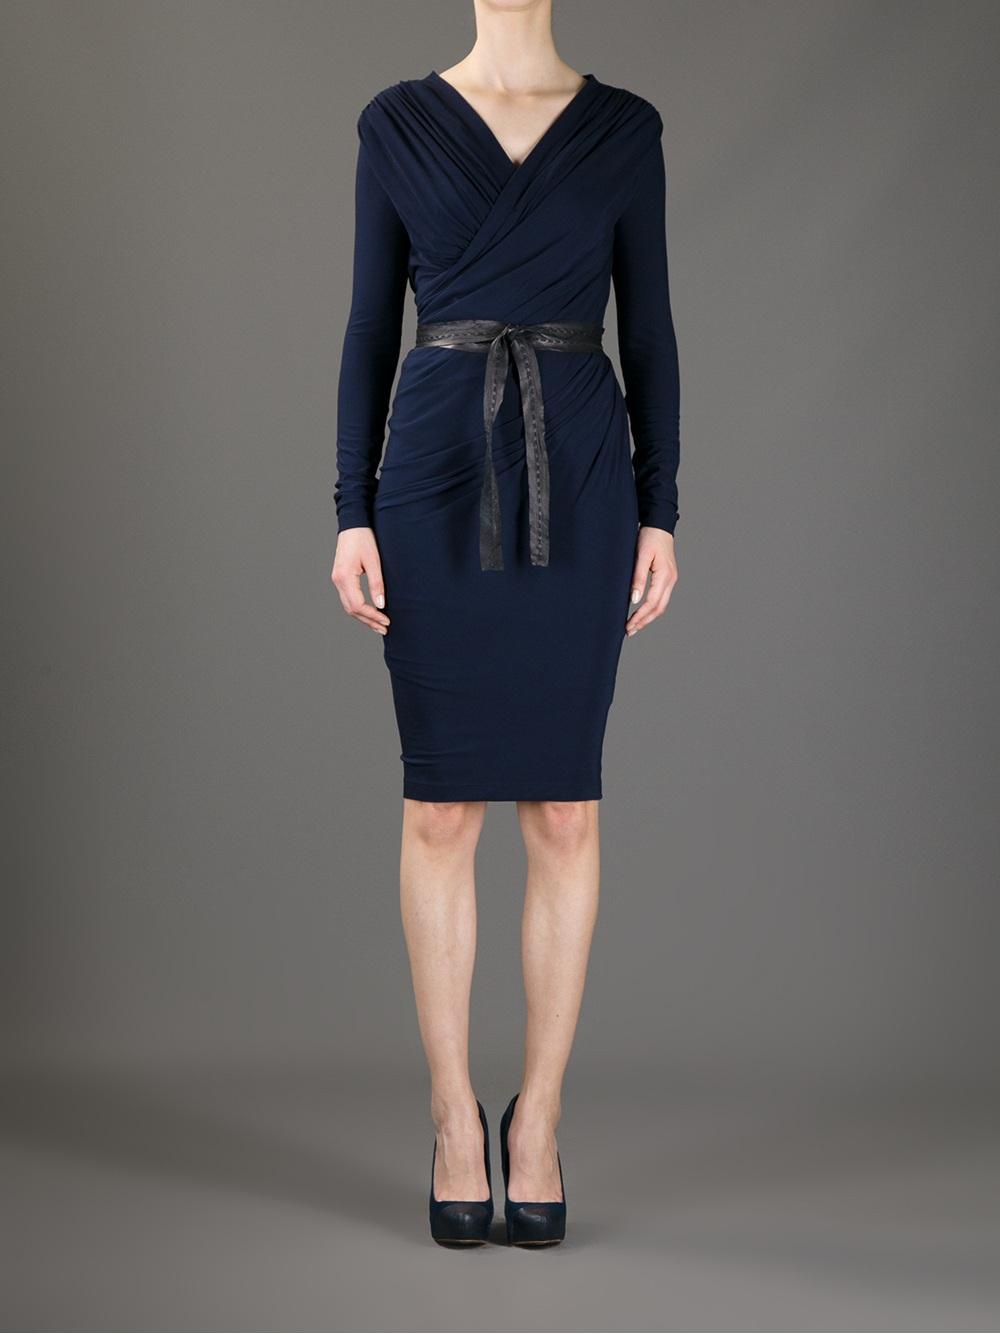 Lyst - Donna Karan Belted Wrap Dress in Blue